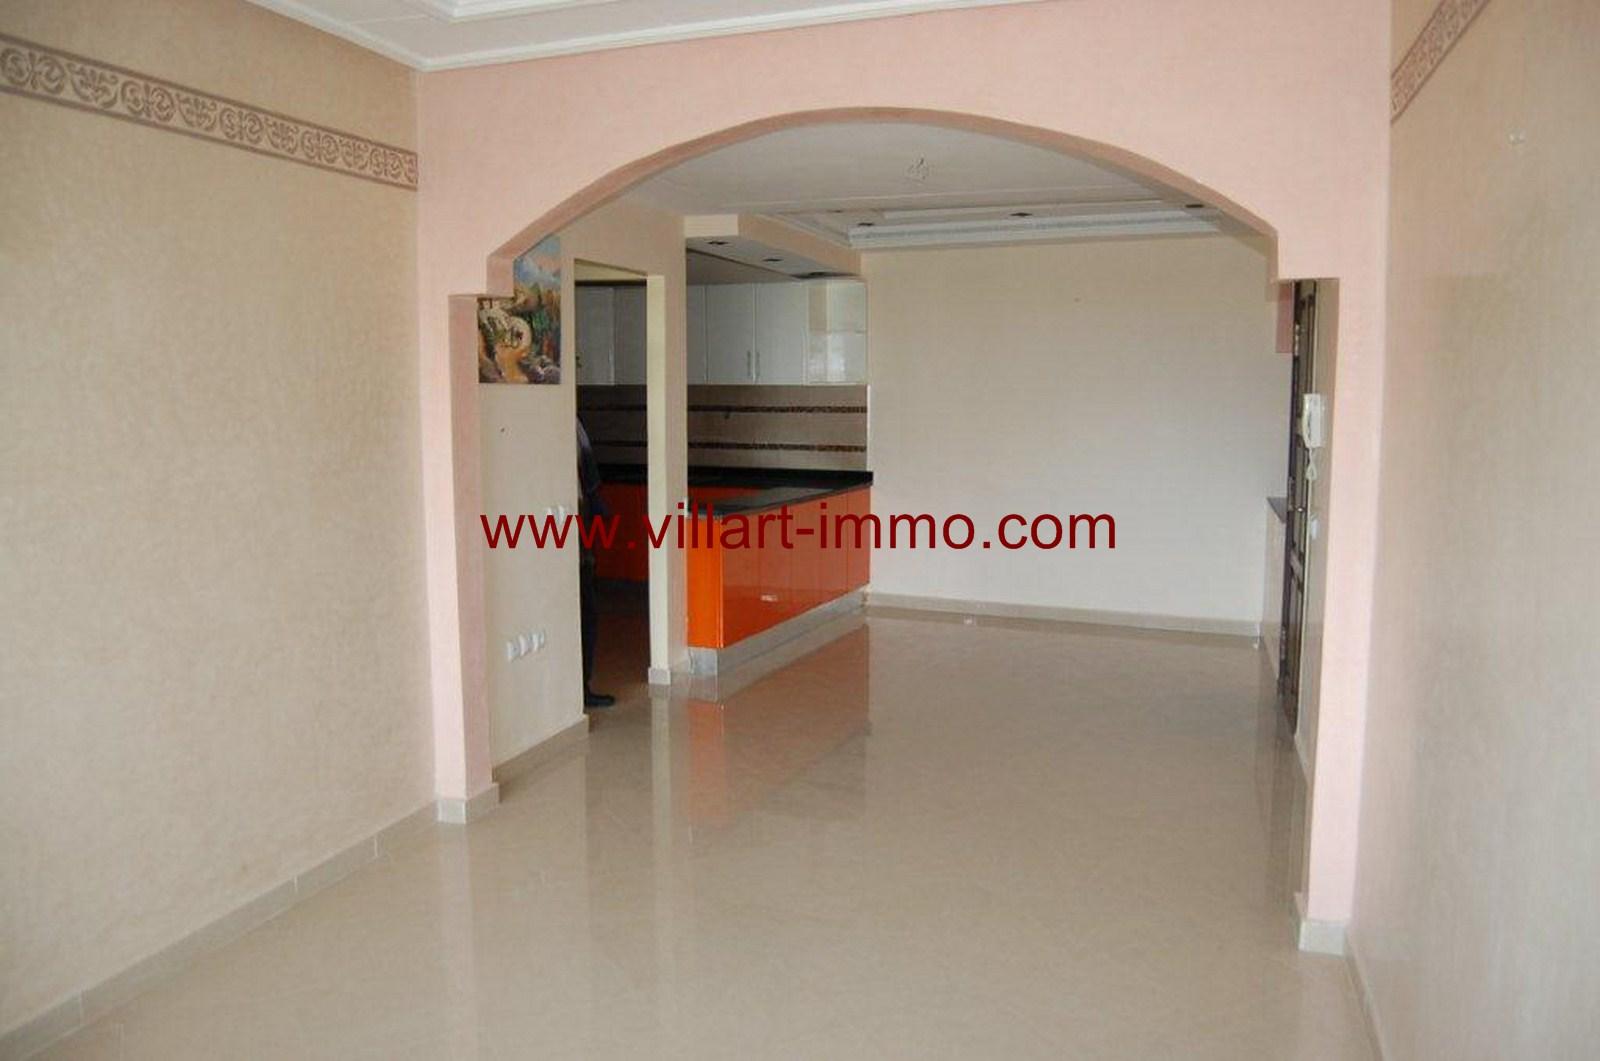 1-location-appartement-non-meuble-centre-ville-tanger-entree-salon-l785-villart-immo